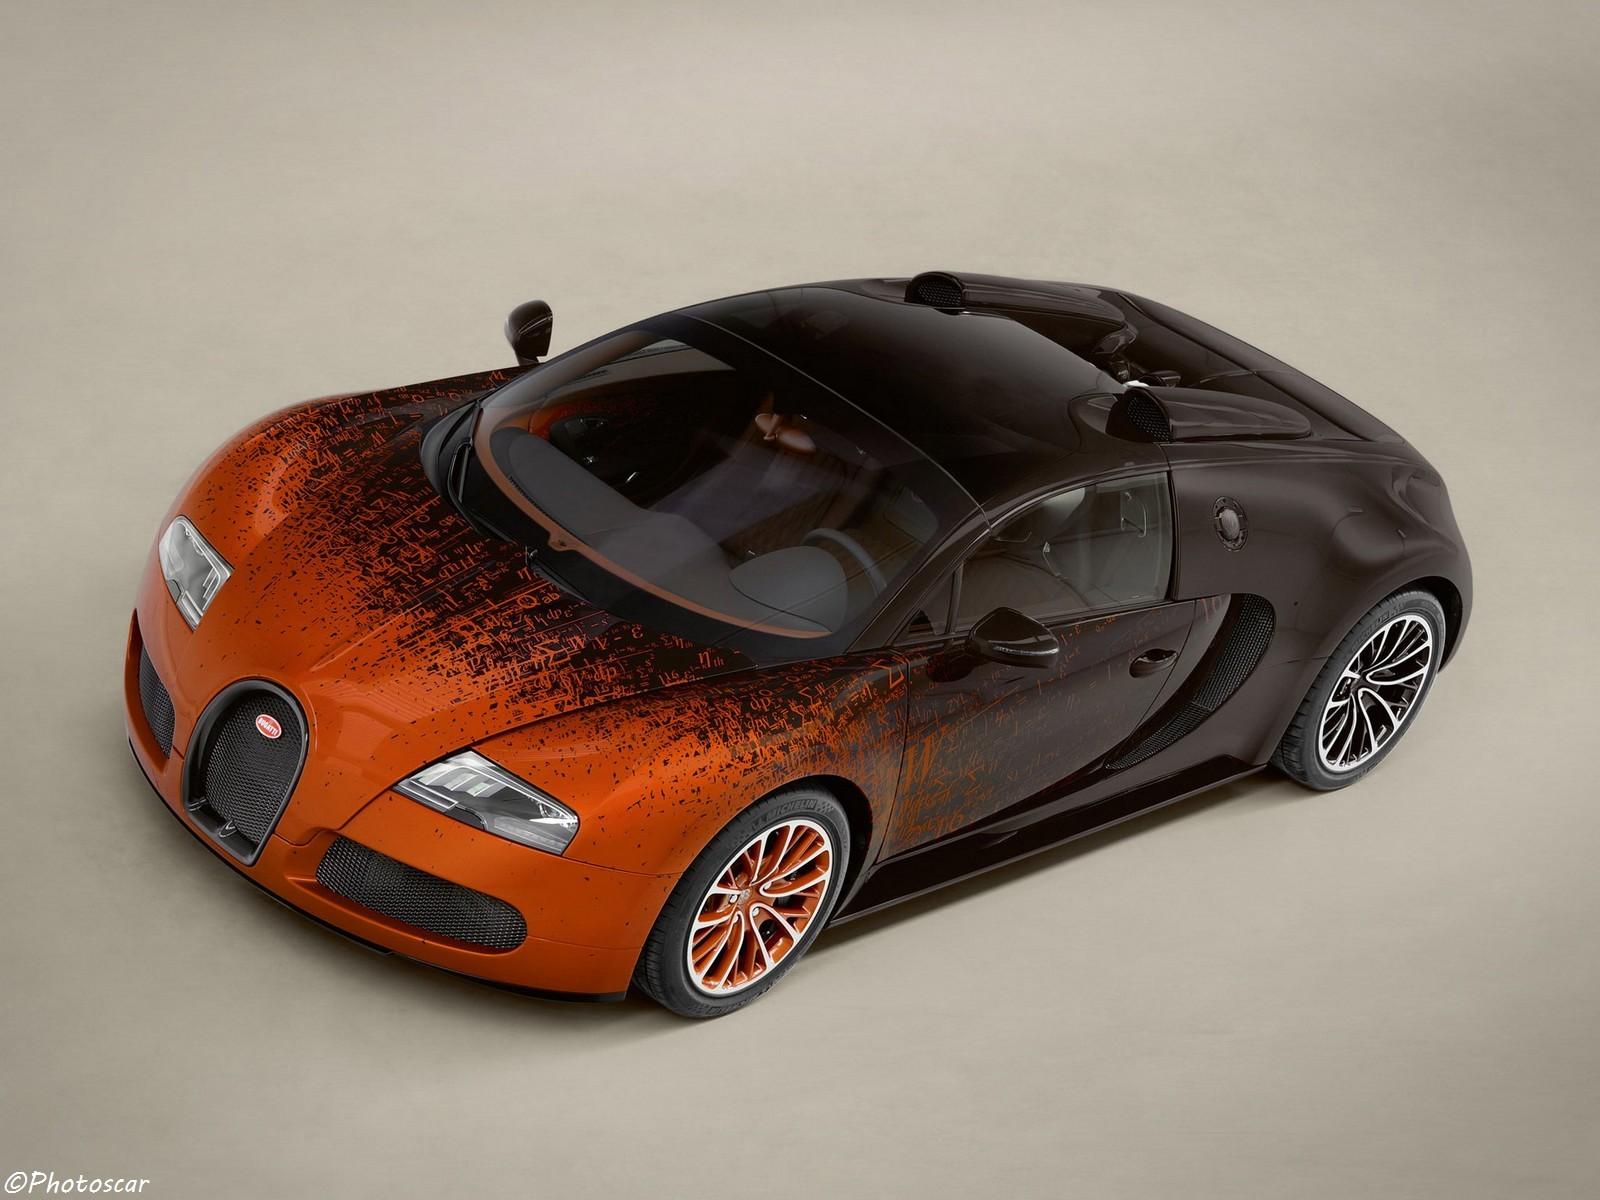 Bugatti Veyron Grand Sport Venet 2012 – Une vraie œuvre d'art